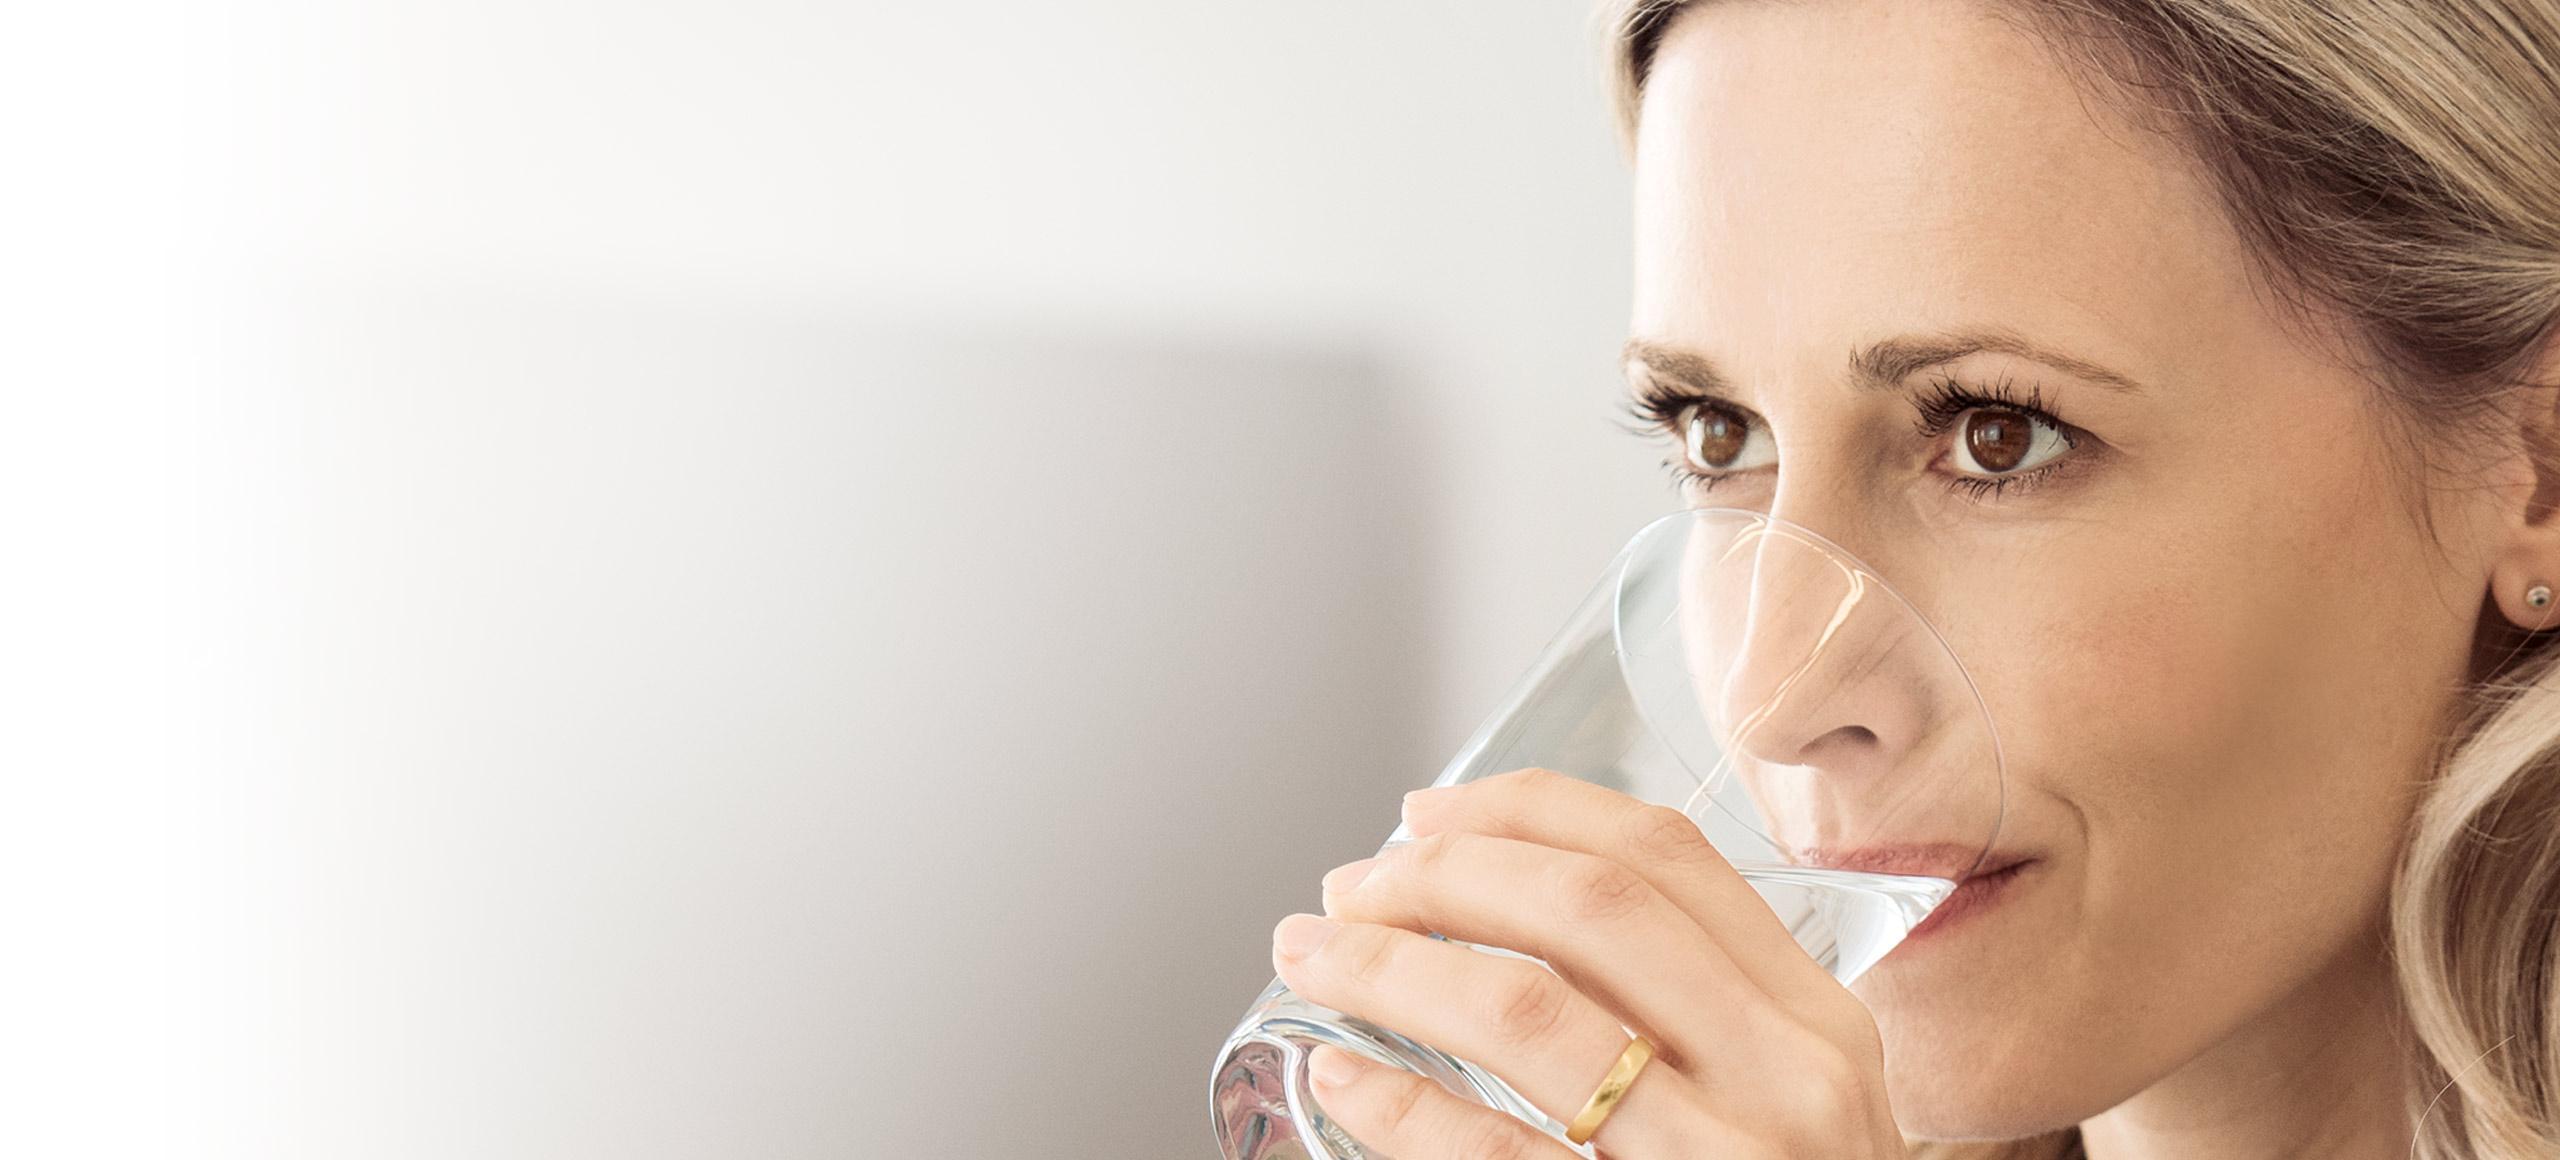 Woman drinking